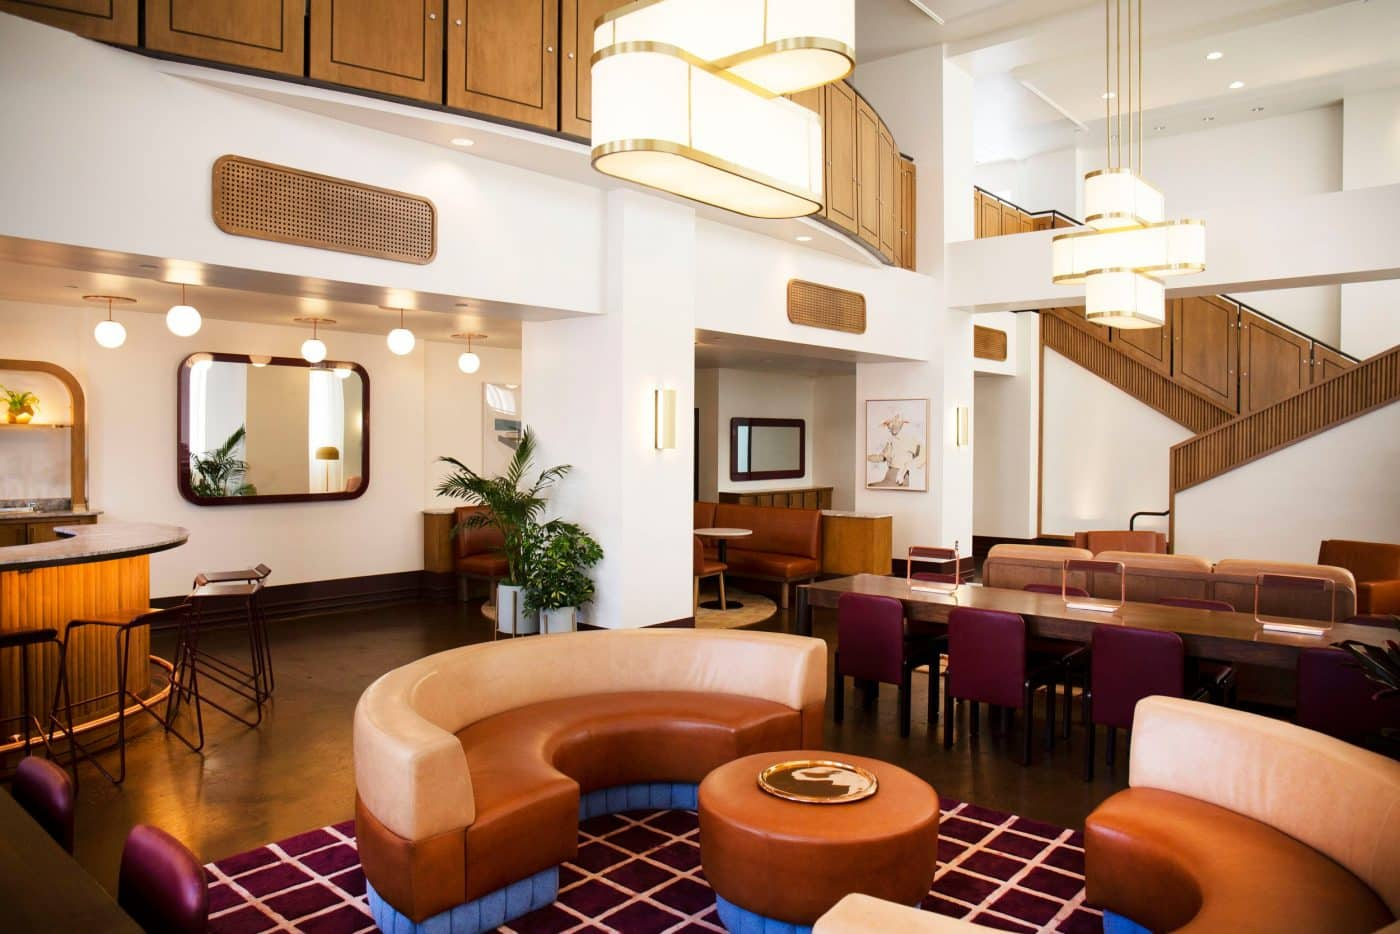 Hu Hotel lobby in Memphis, designed by Home Studios